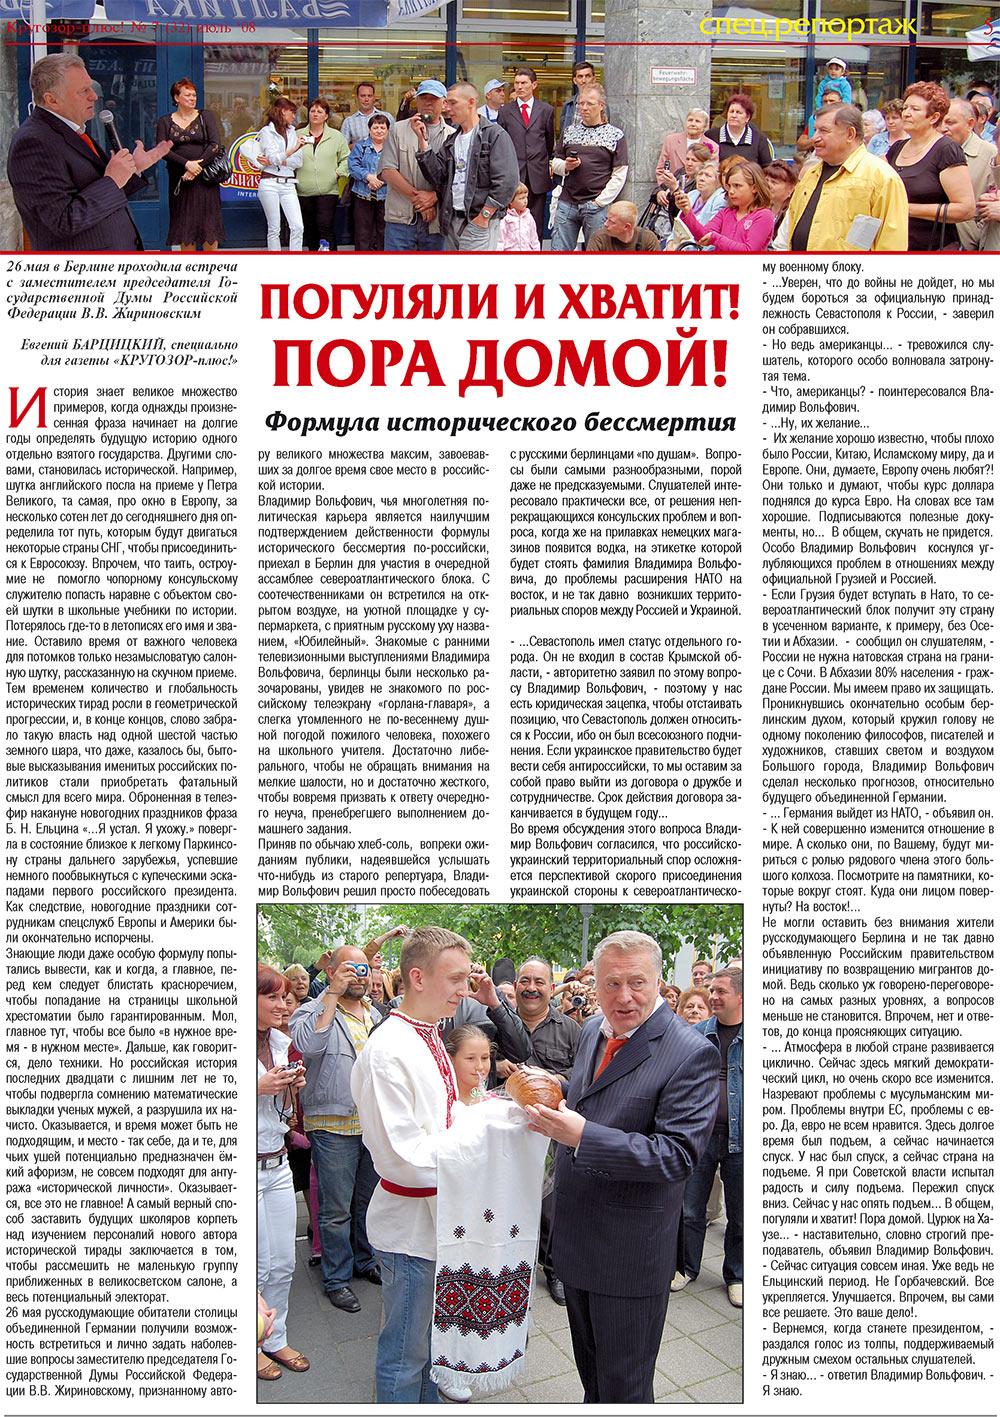 Кругозор плюс! (газета). 2008 год, номер 7, стр. 5